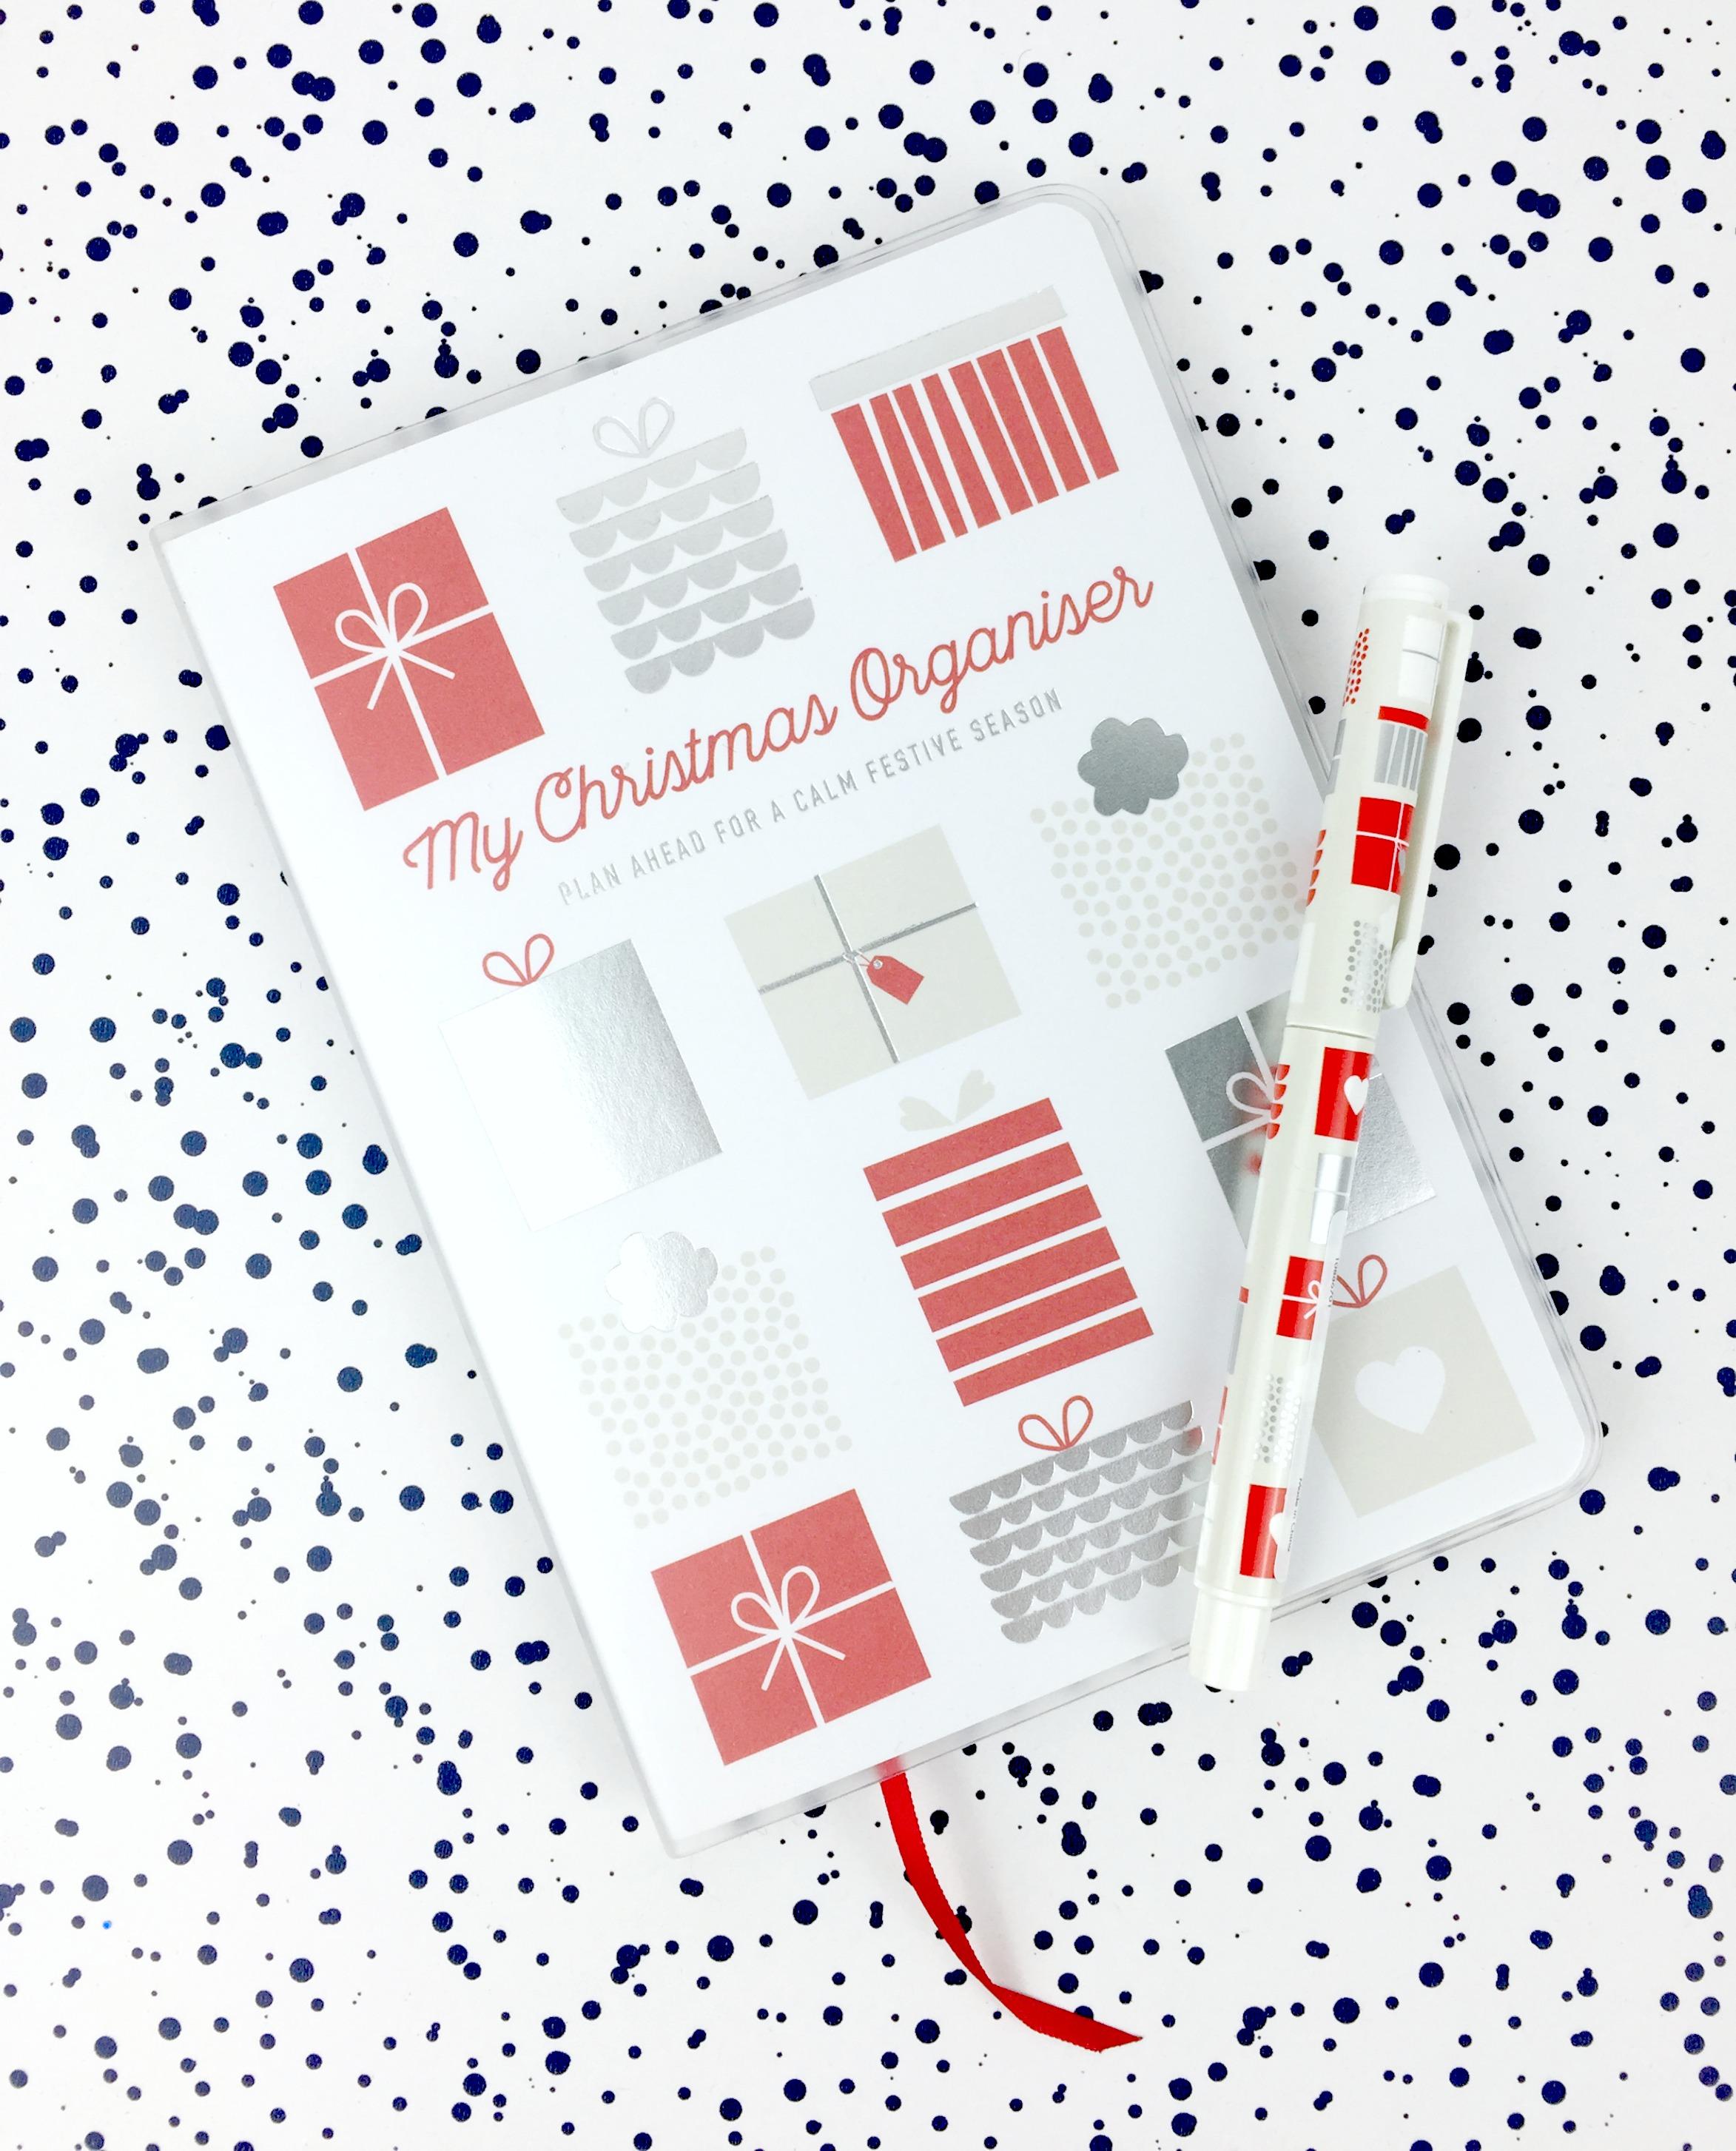 kikki-christmas-organiser-daphnerosa